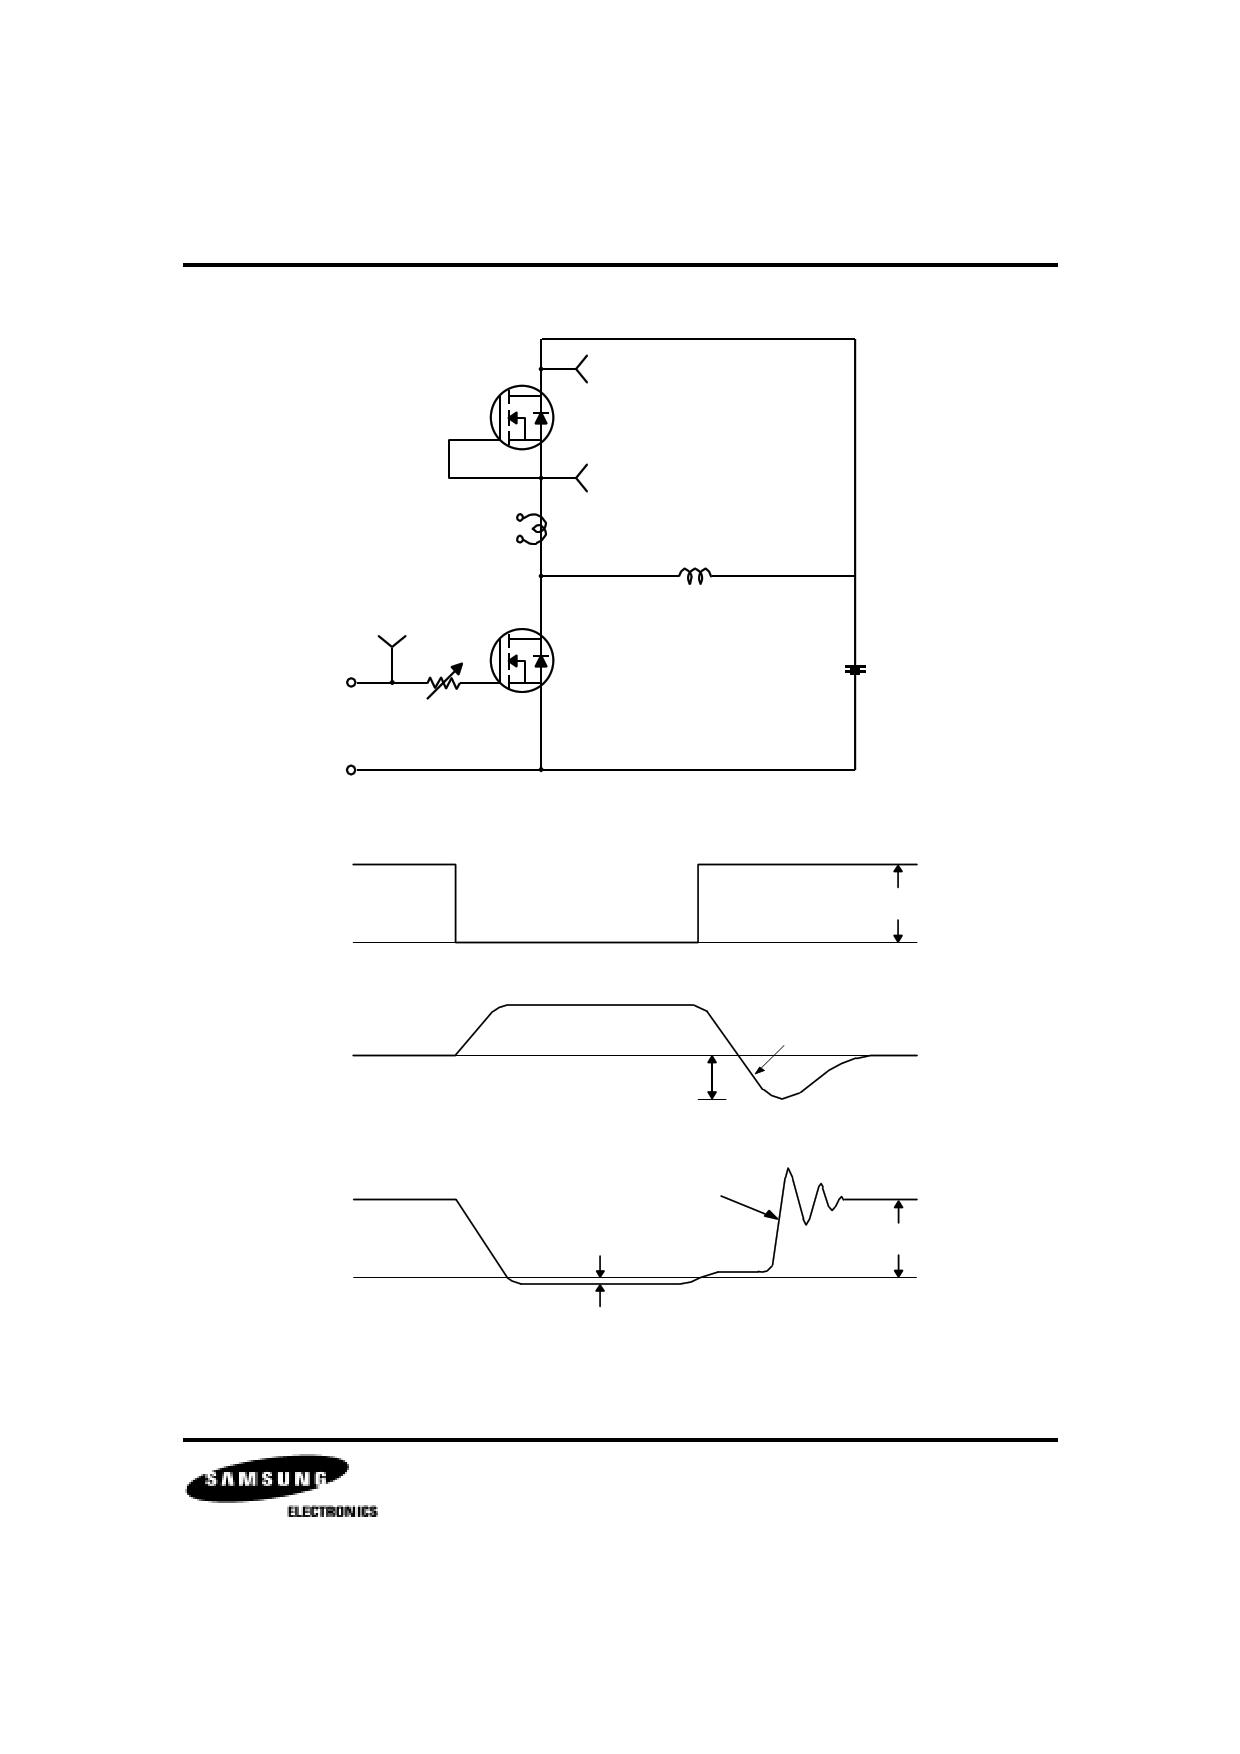 IRFZ34A 電子部品, 半導体